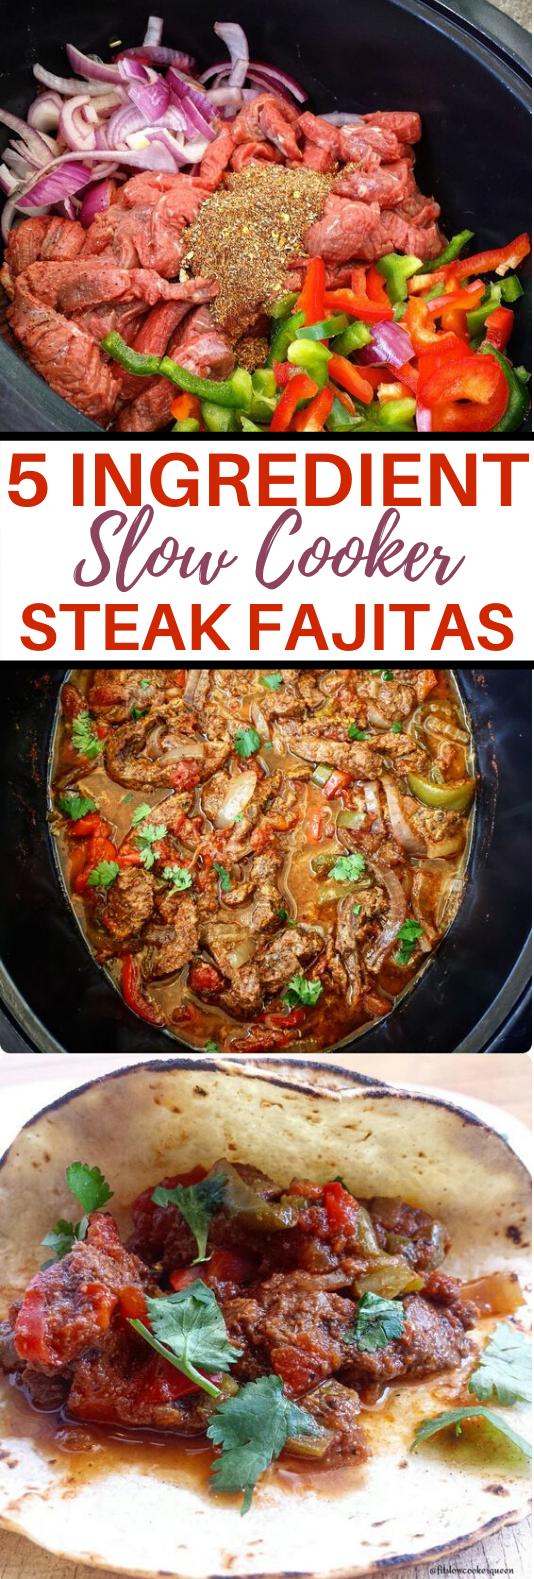 5-Ingredient Slow Cooker/Instant Pot Steak Fajitas #dinner #slowcooker #steaks #meat #wraps